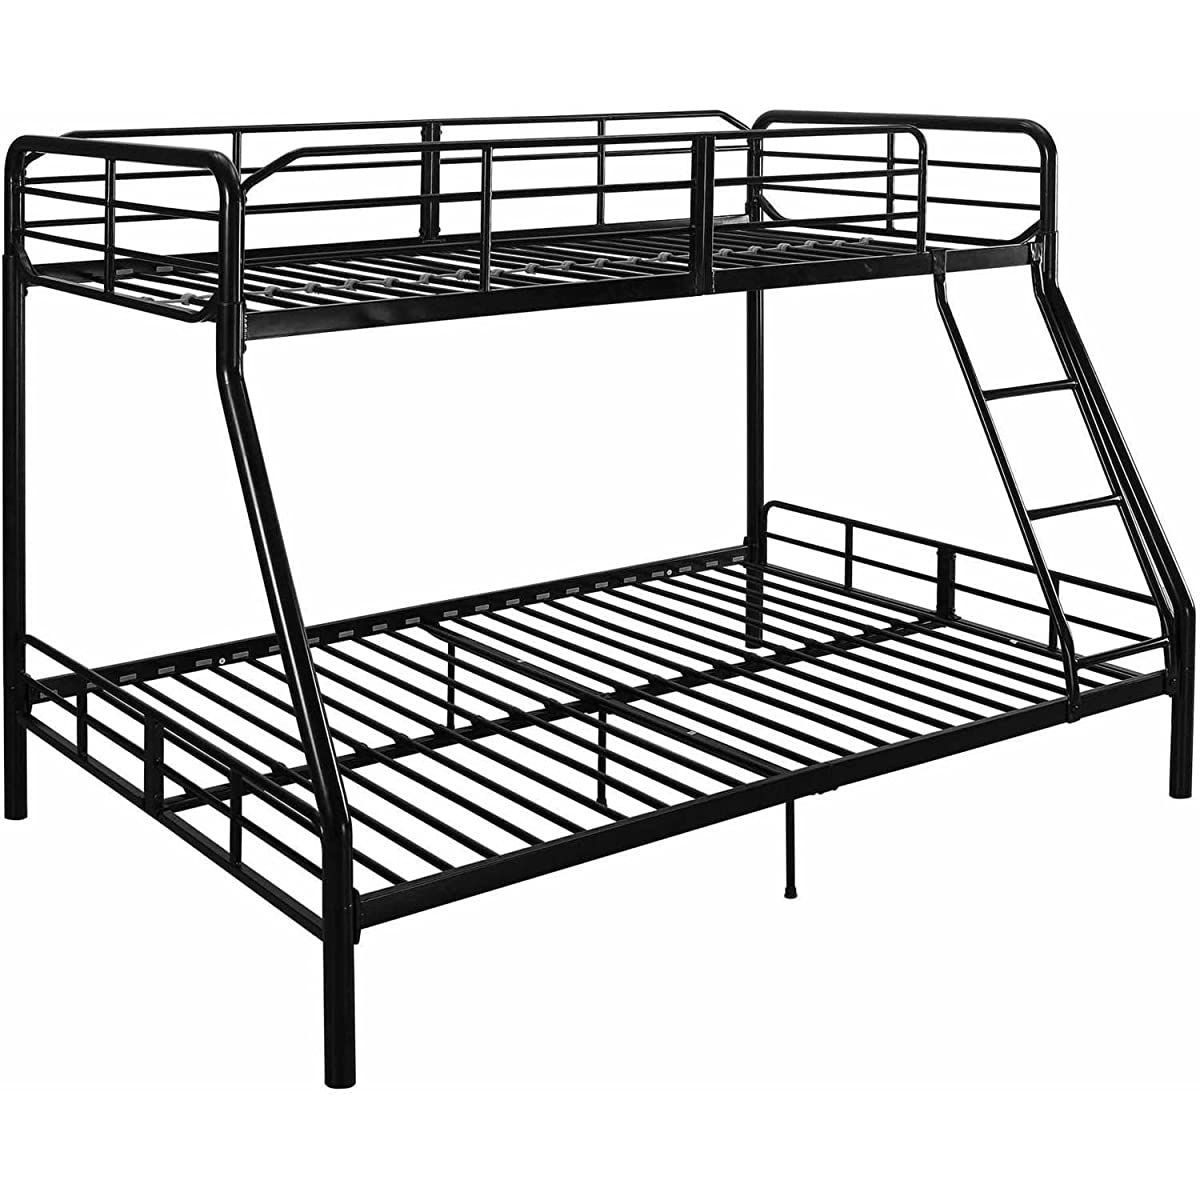 Twin Over Full Bunk Bed Kids Teens Bedroom Dorm Furniture Metal Beds Bunkbeds With Ladder Black By Mainstays Metal Bunk Beds Bunk Beds Twin Over Full Bunk Bed Metal frame bunk beds twin over full